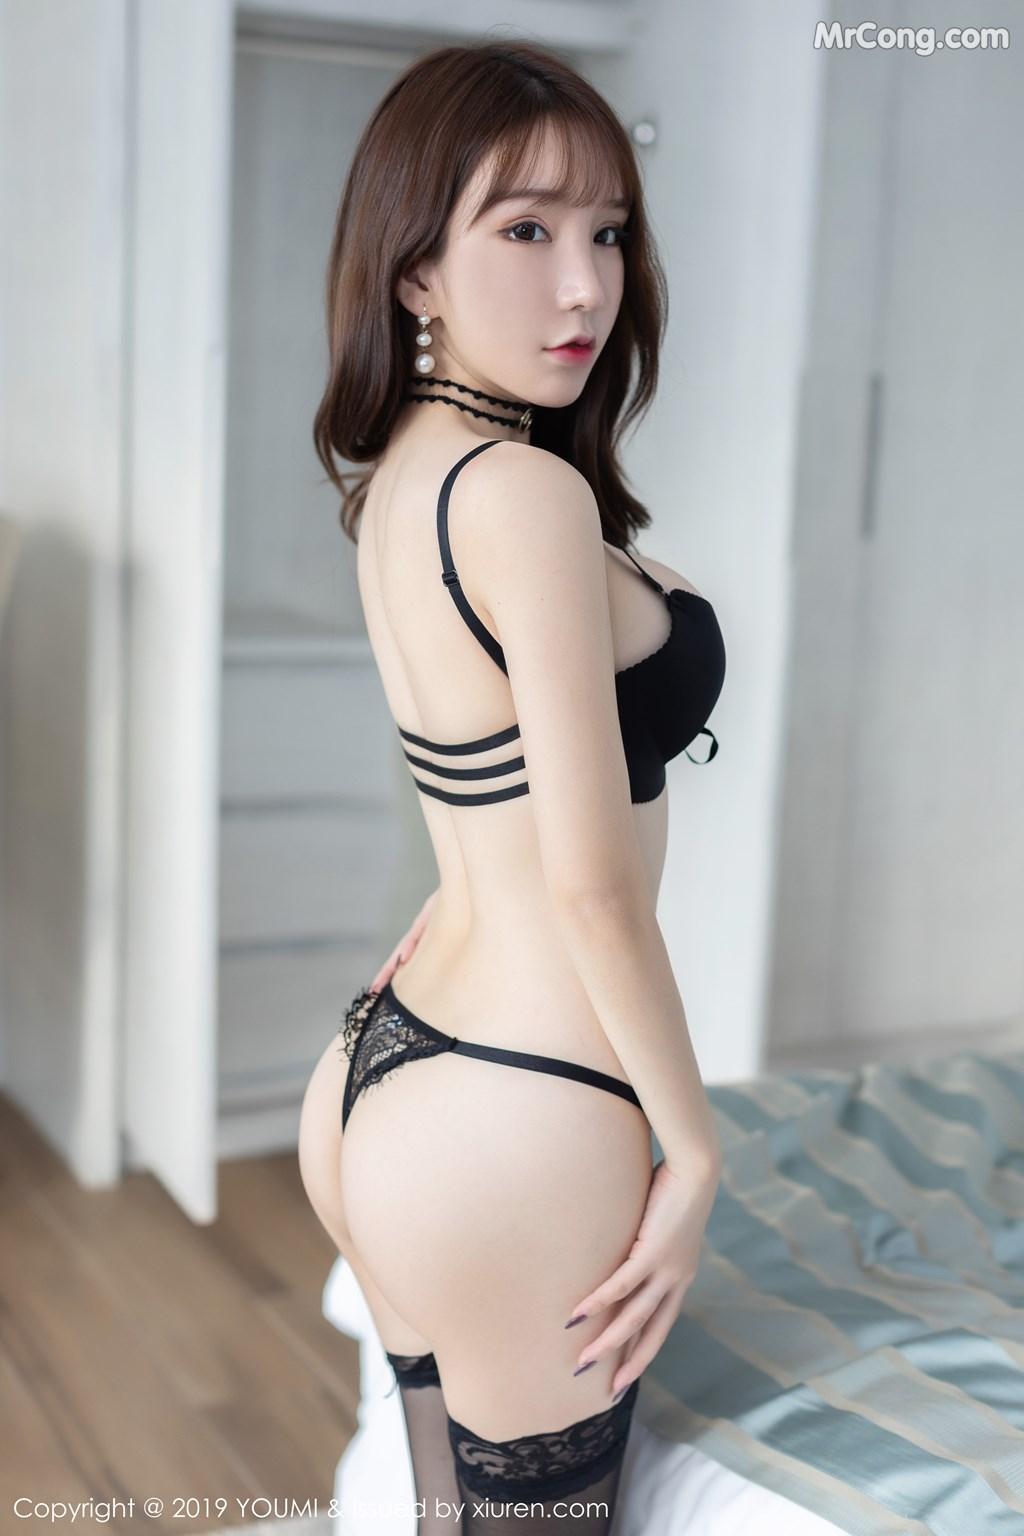 YouMi Vol.395: Zhou Yuxi (周 于 希 Sandy) (58 photos)